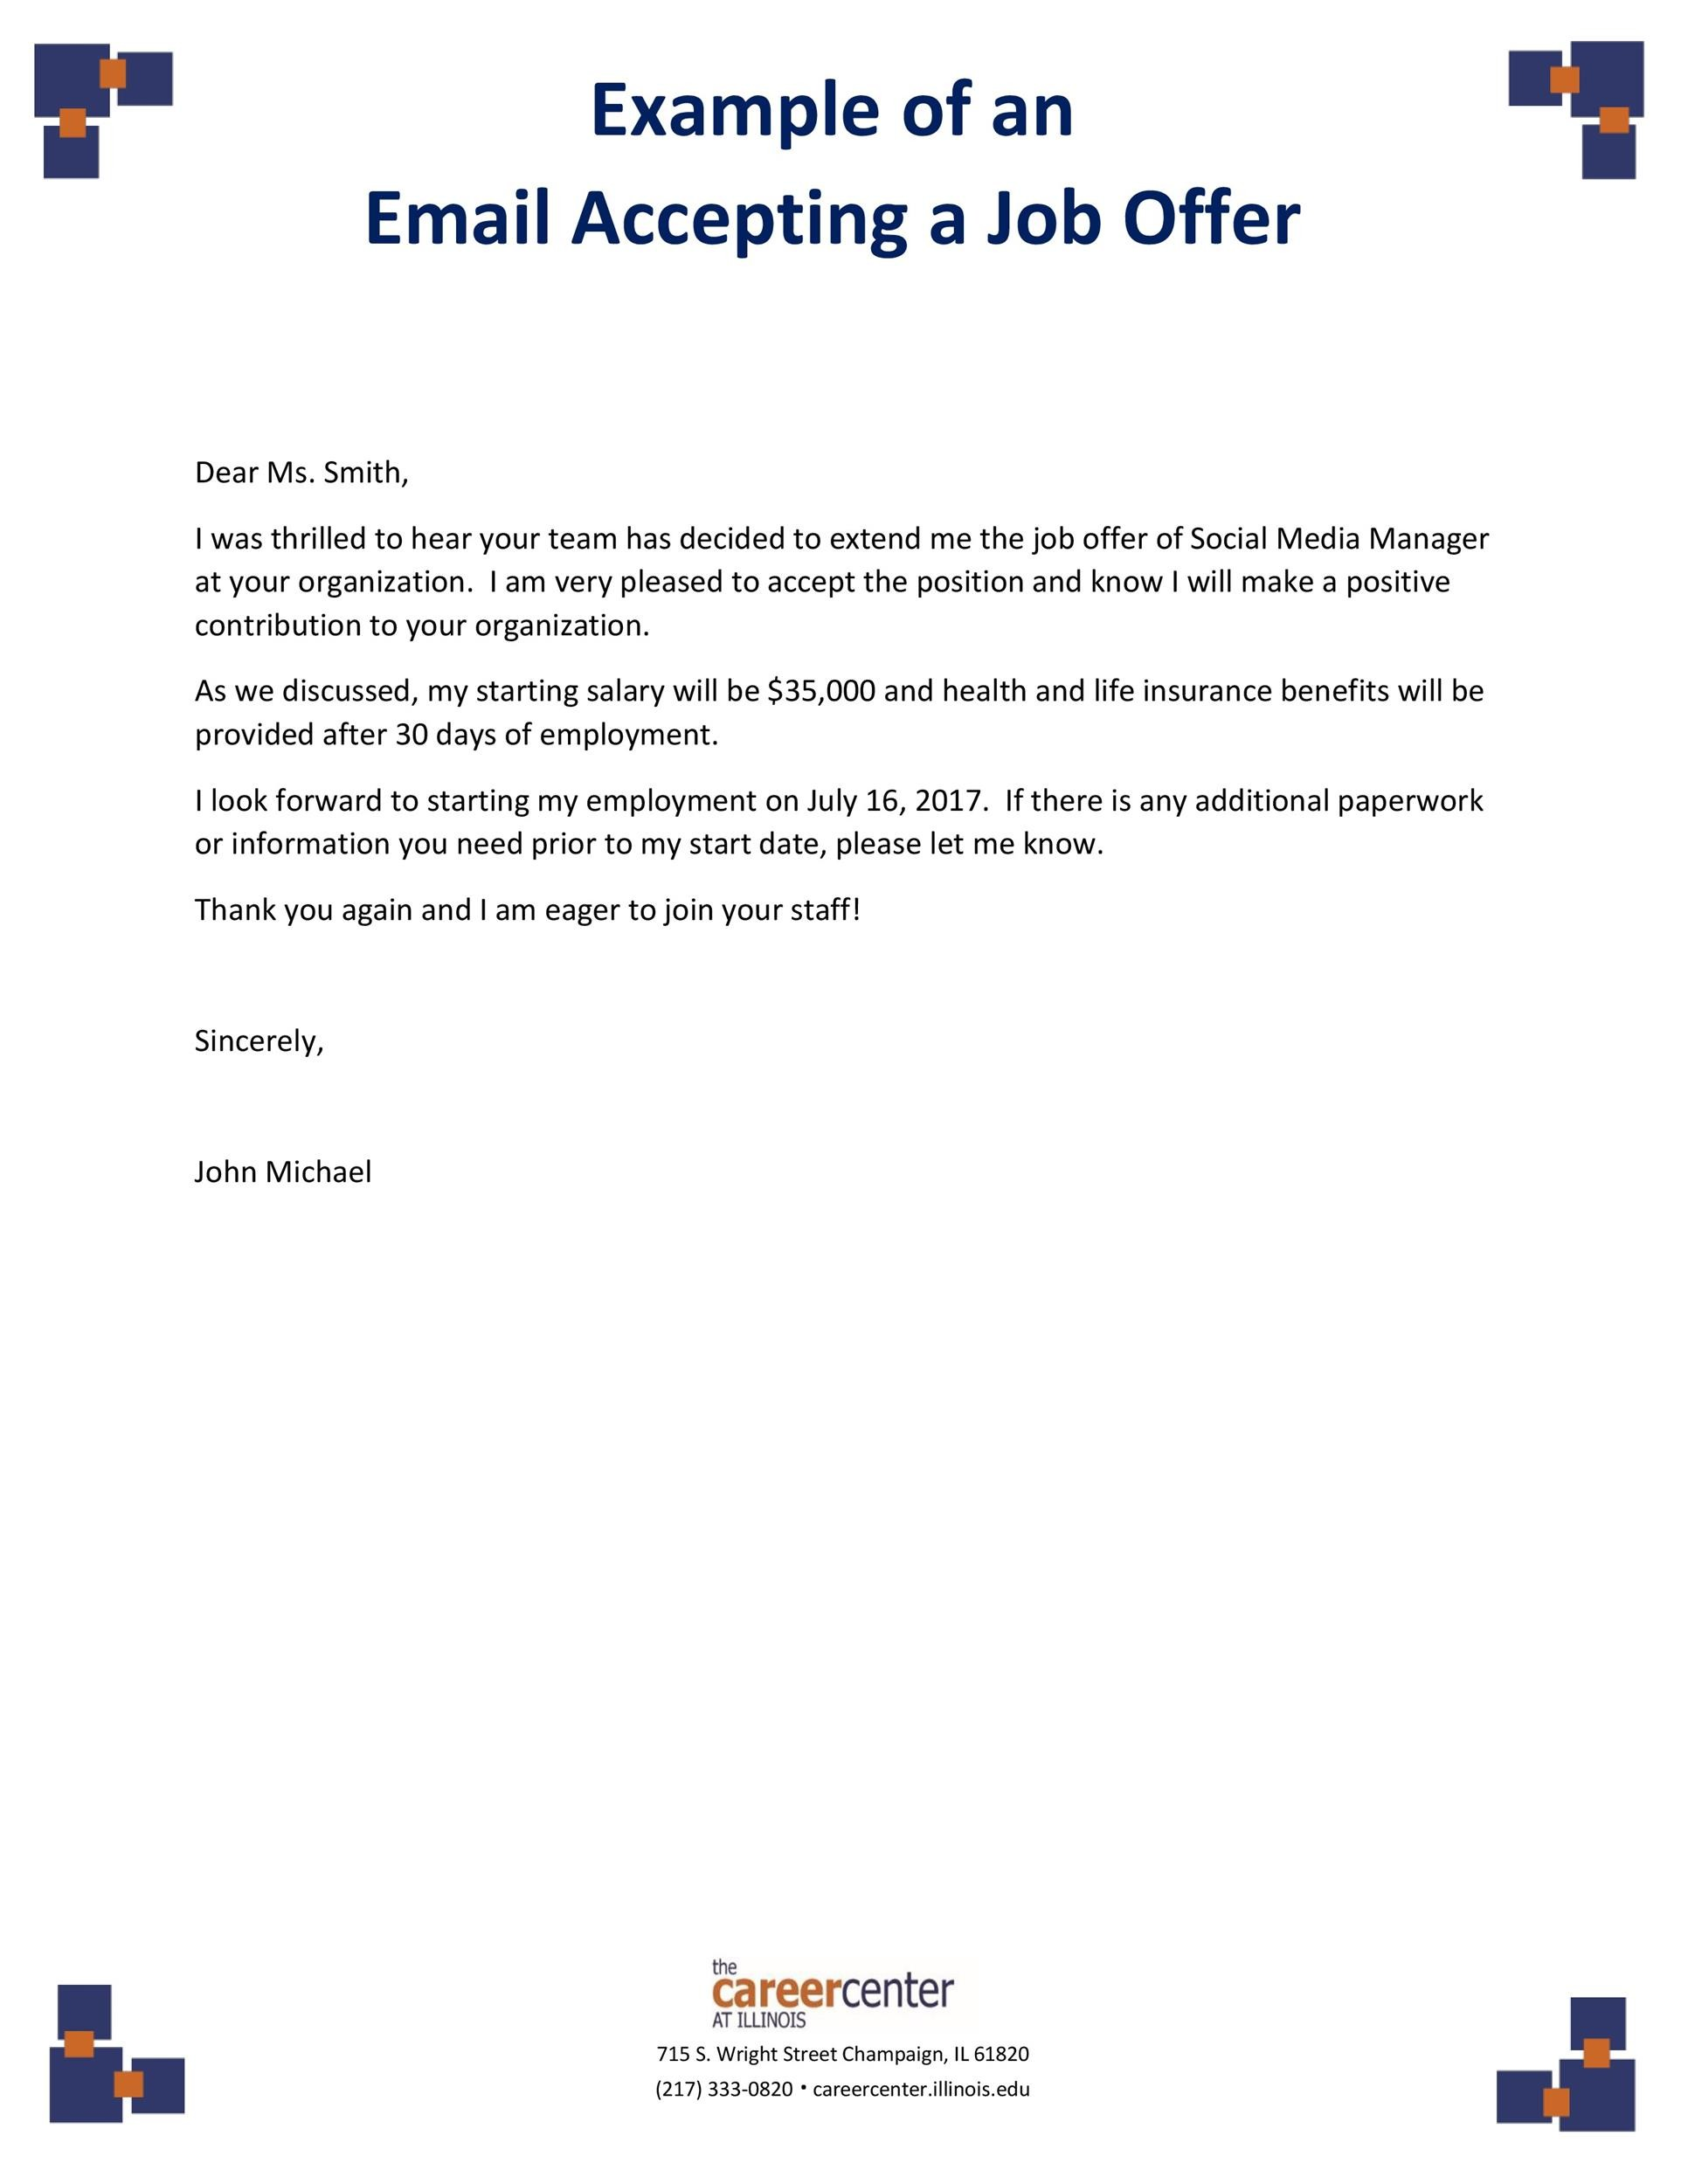 Free job acceptance letter 23